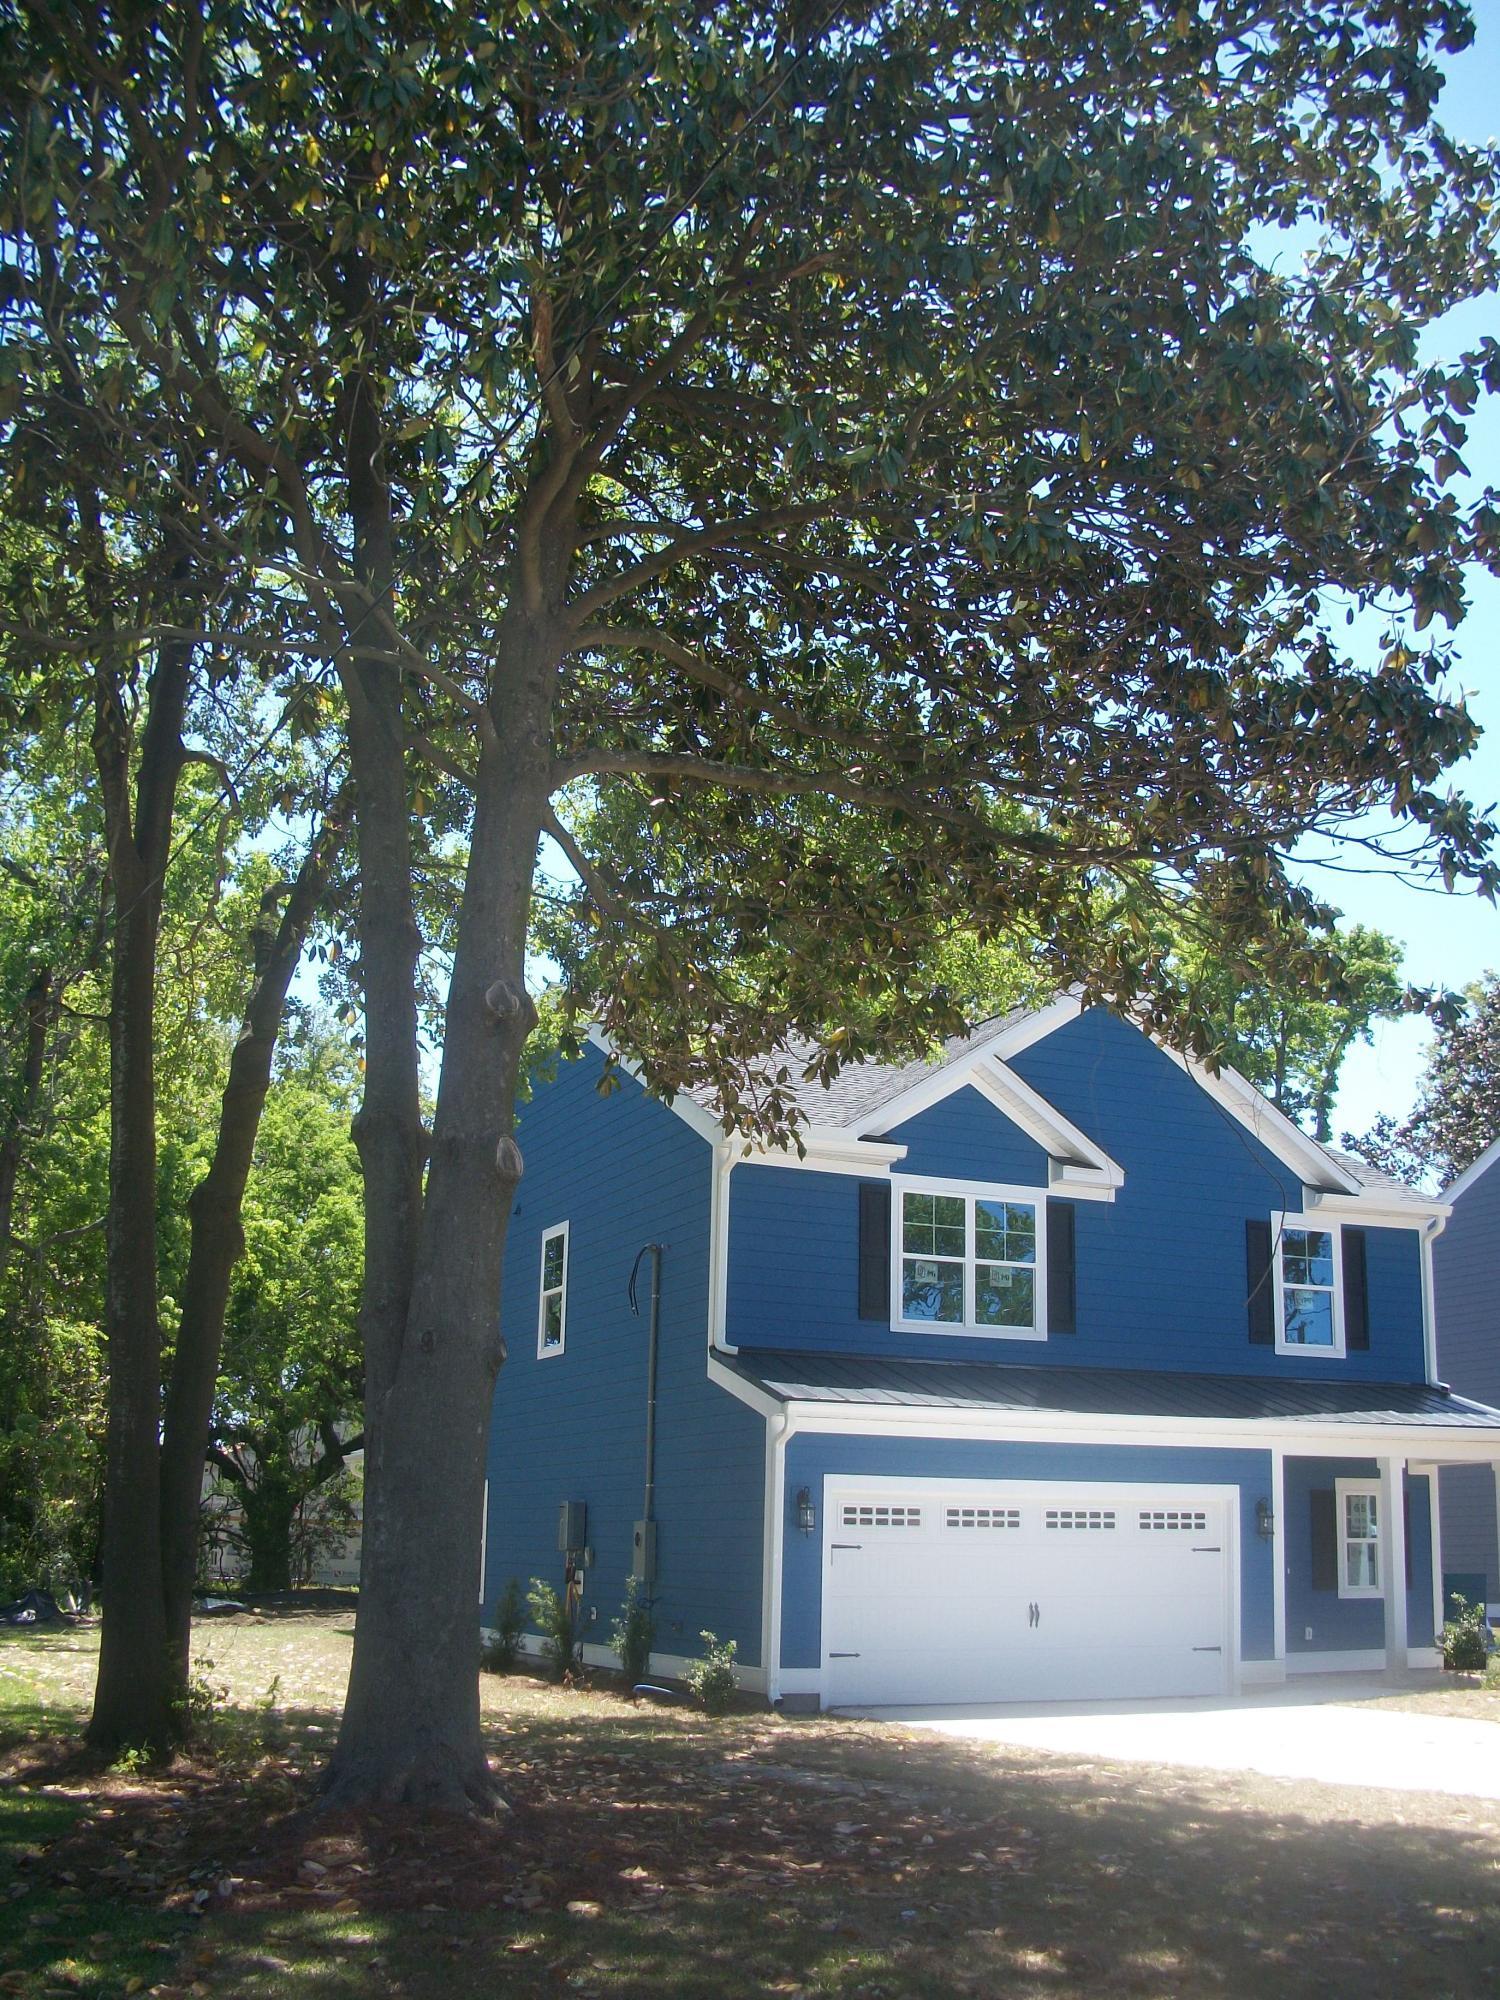 Filbin Creek Homes For Sale - 1173 Sumner, North Charleston, SC - 6